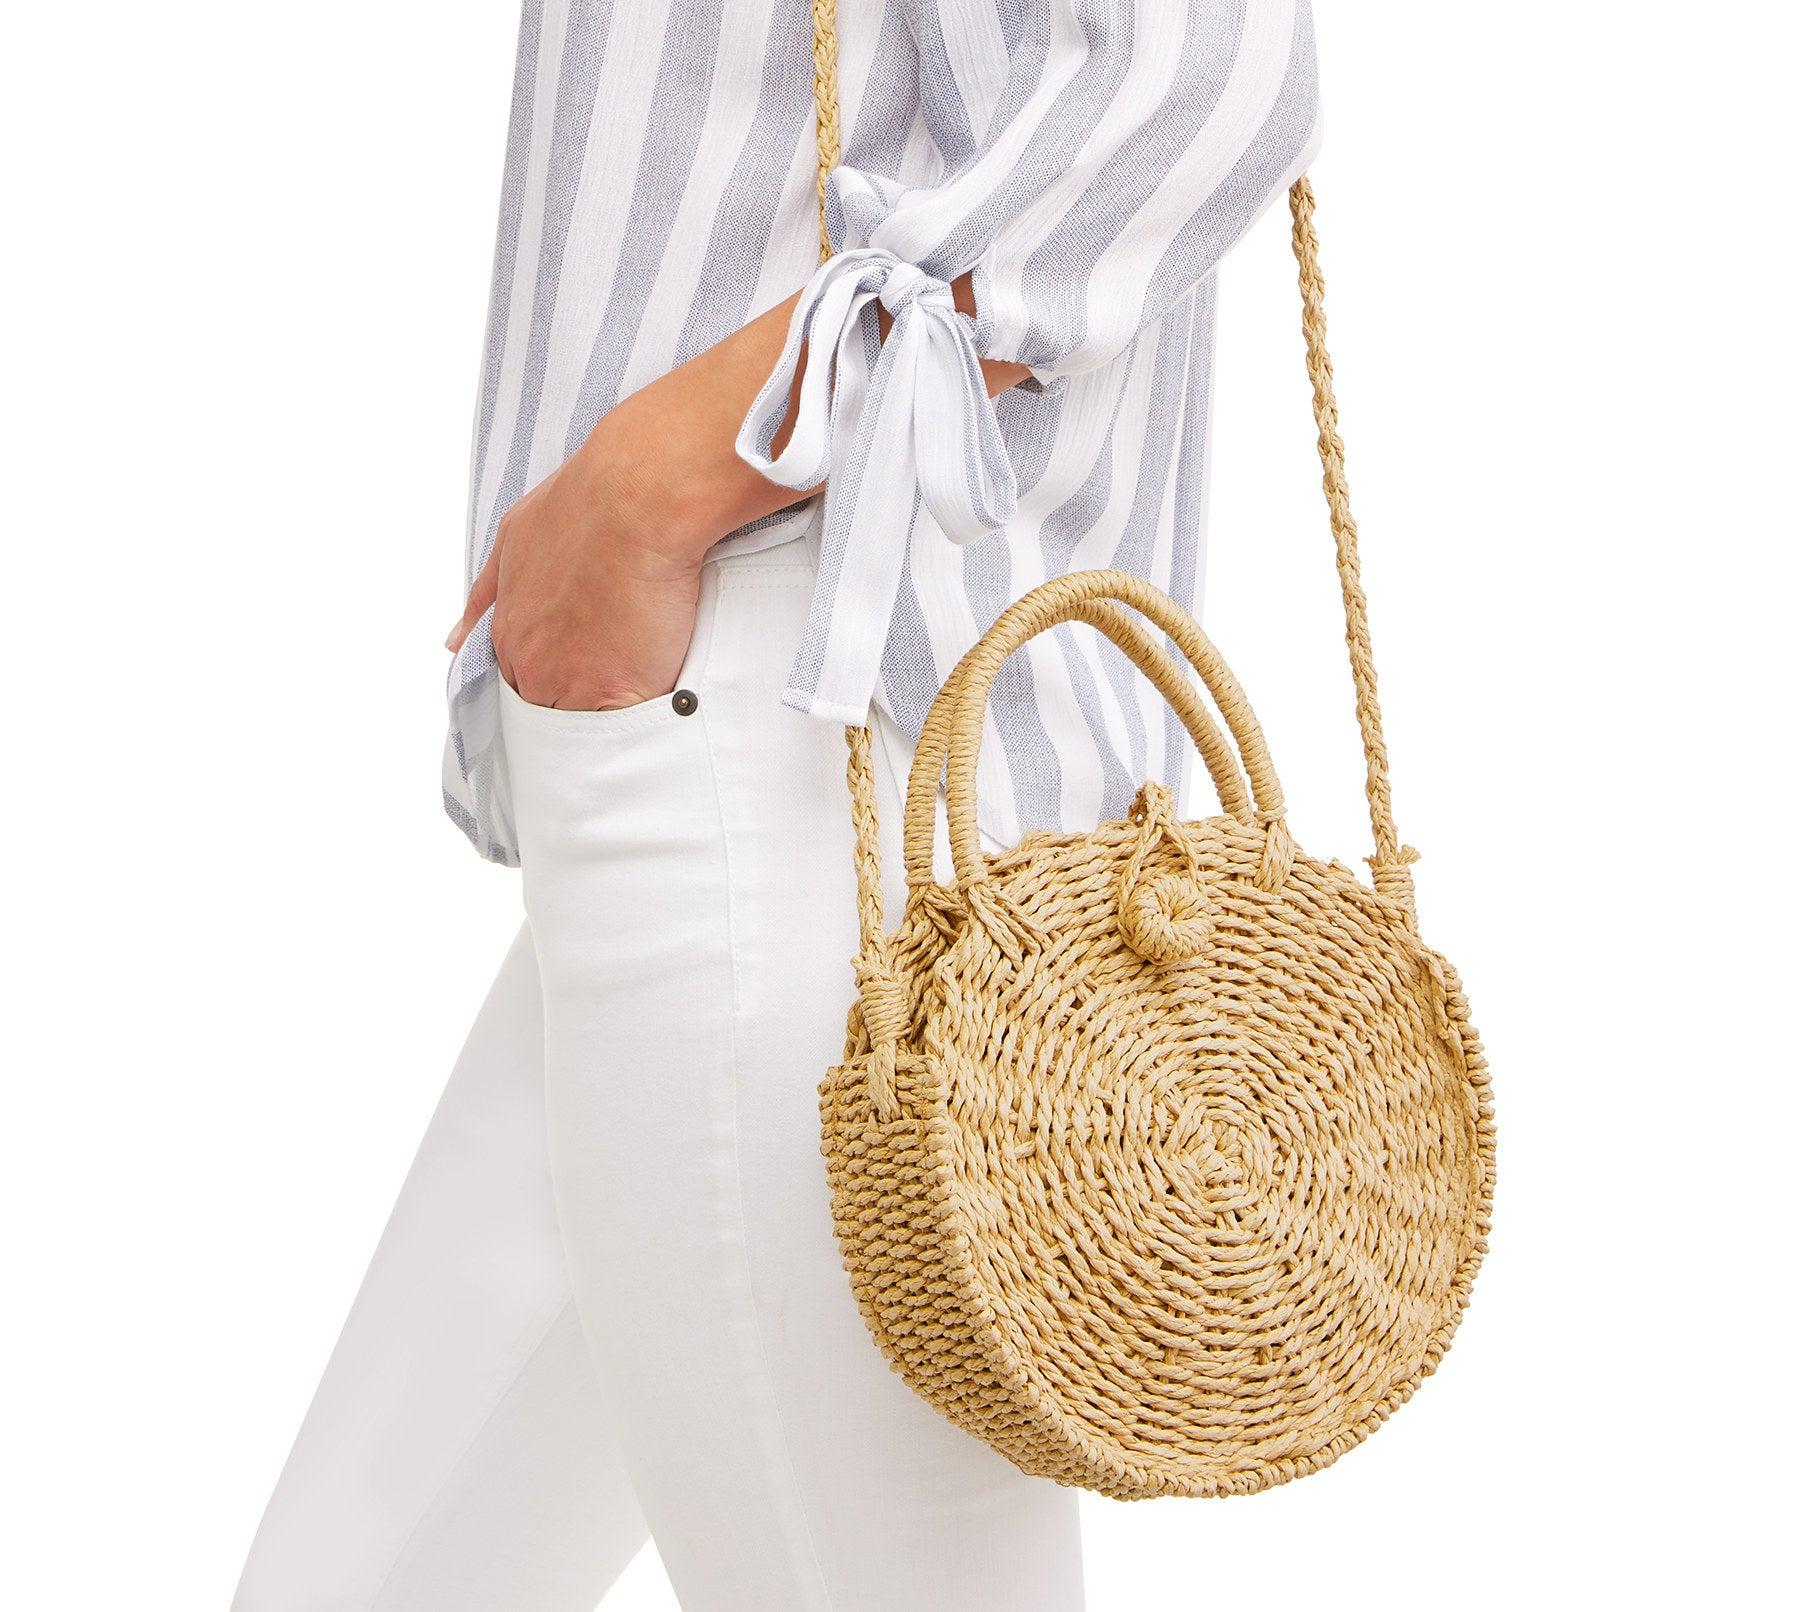 a model wearing the bag as a cross body